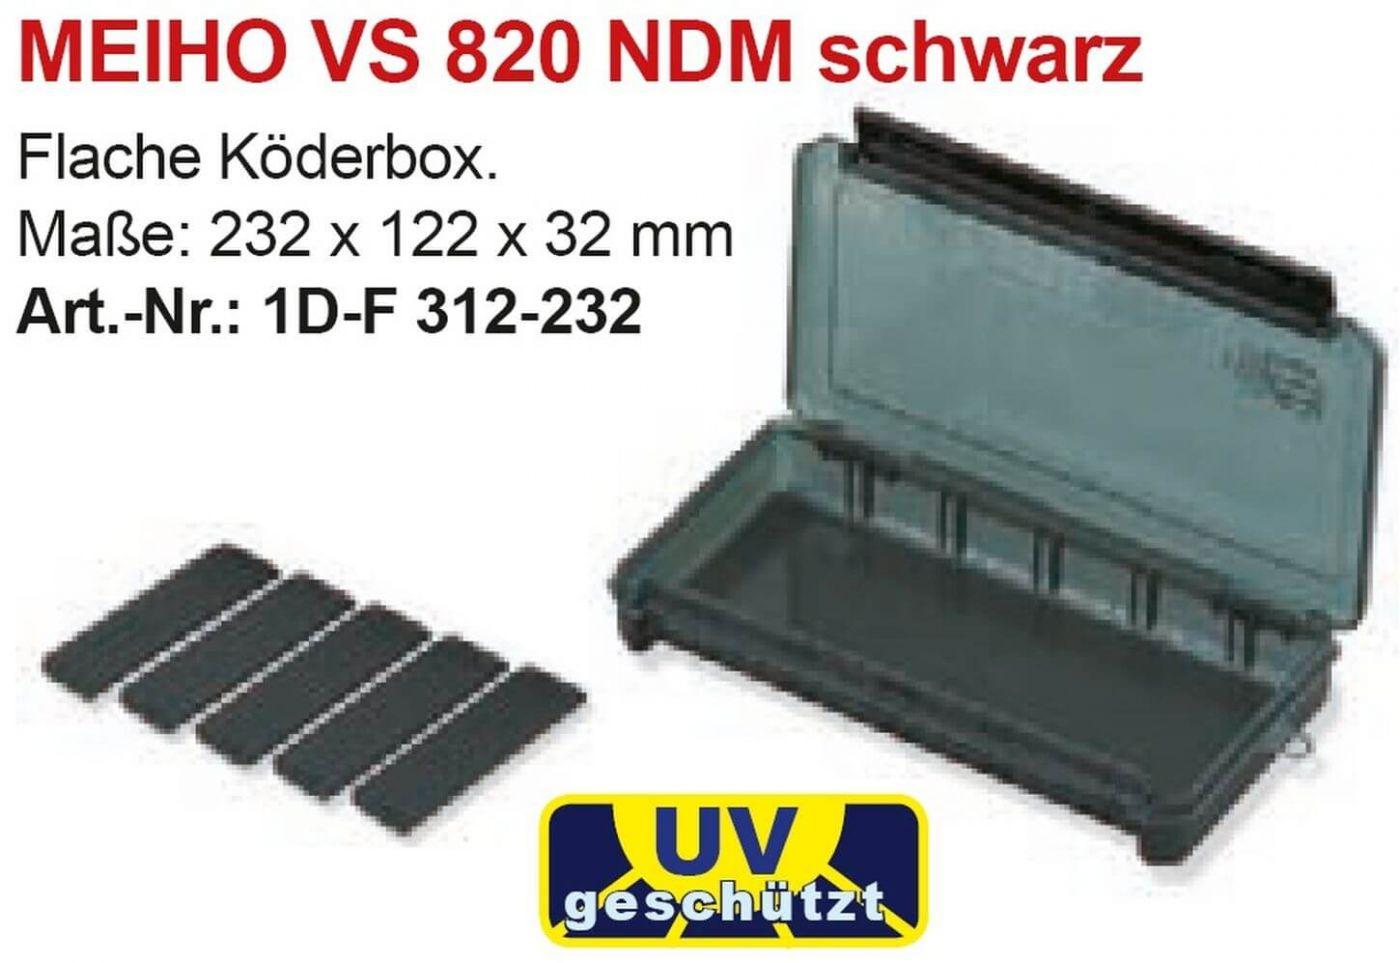 MEIHO VS-3010 NDM schwarz